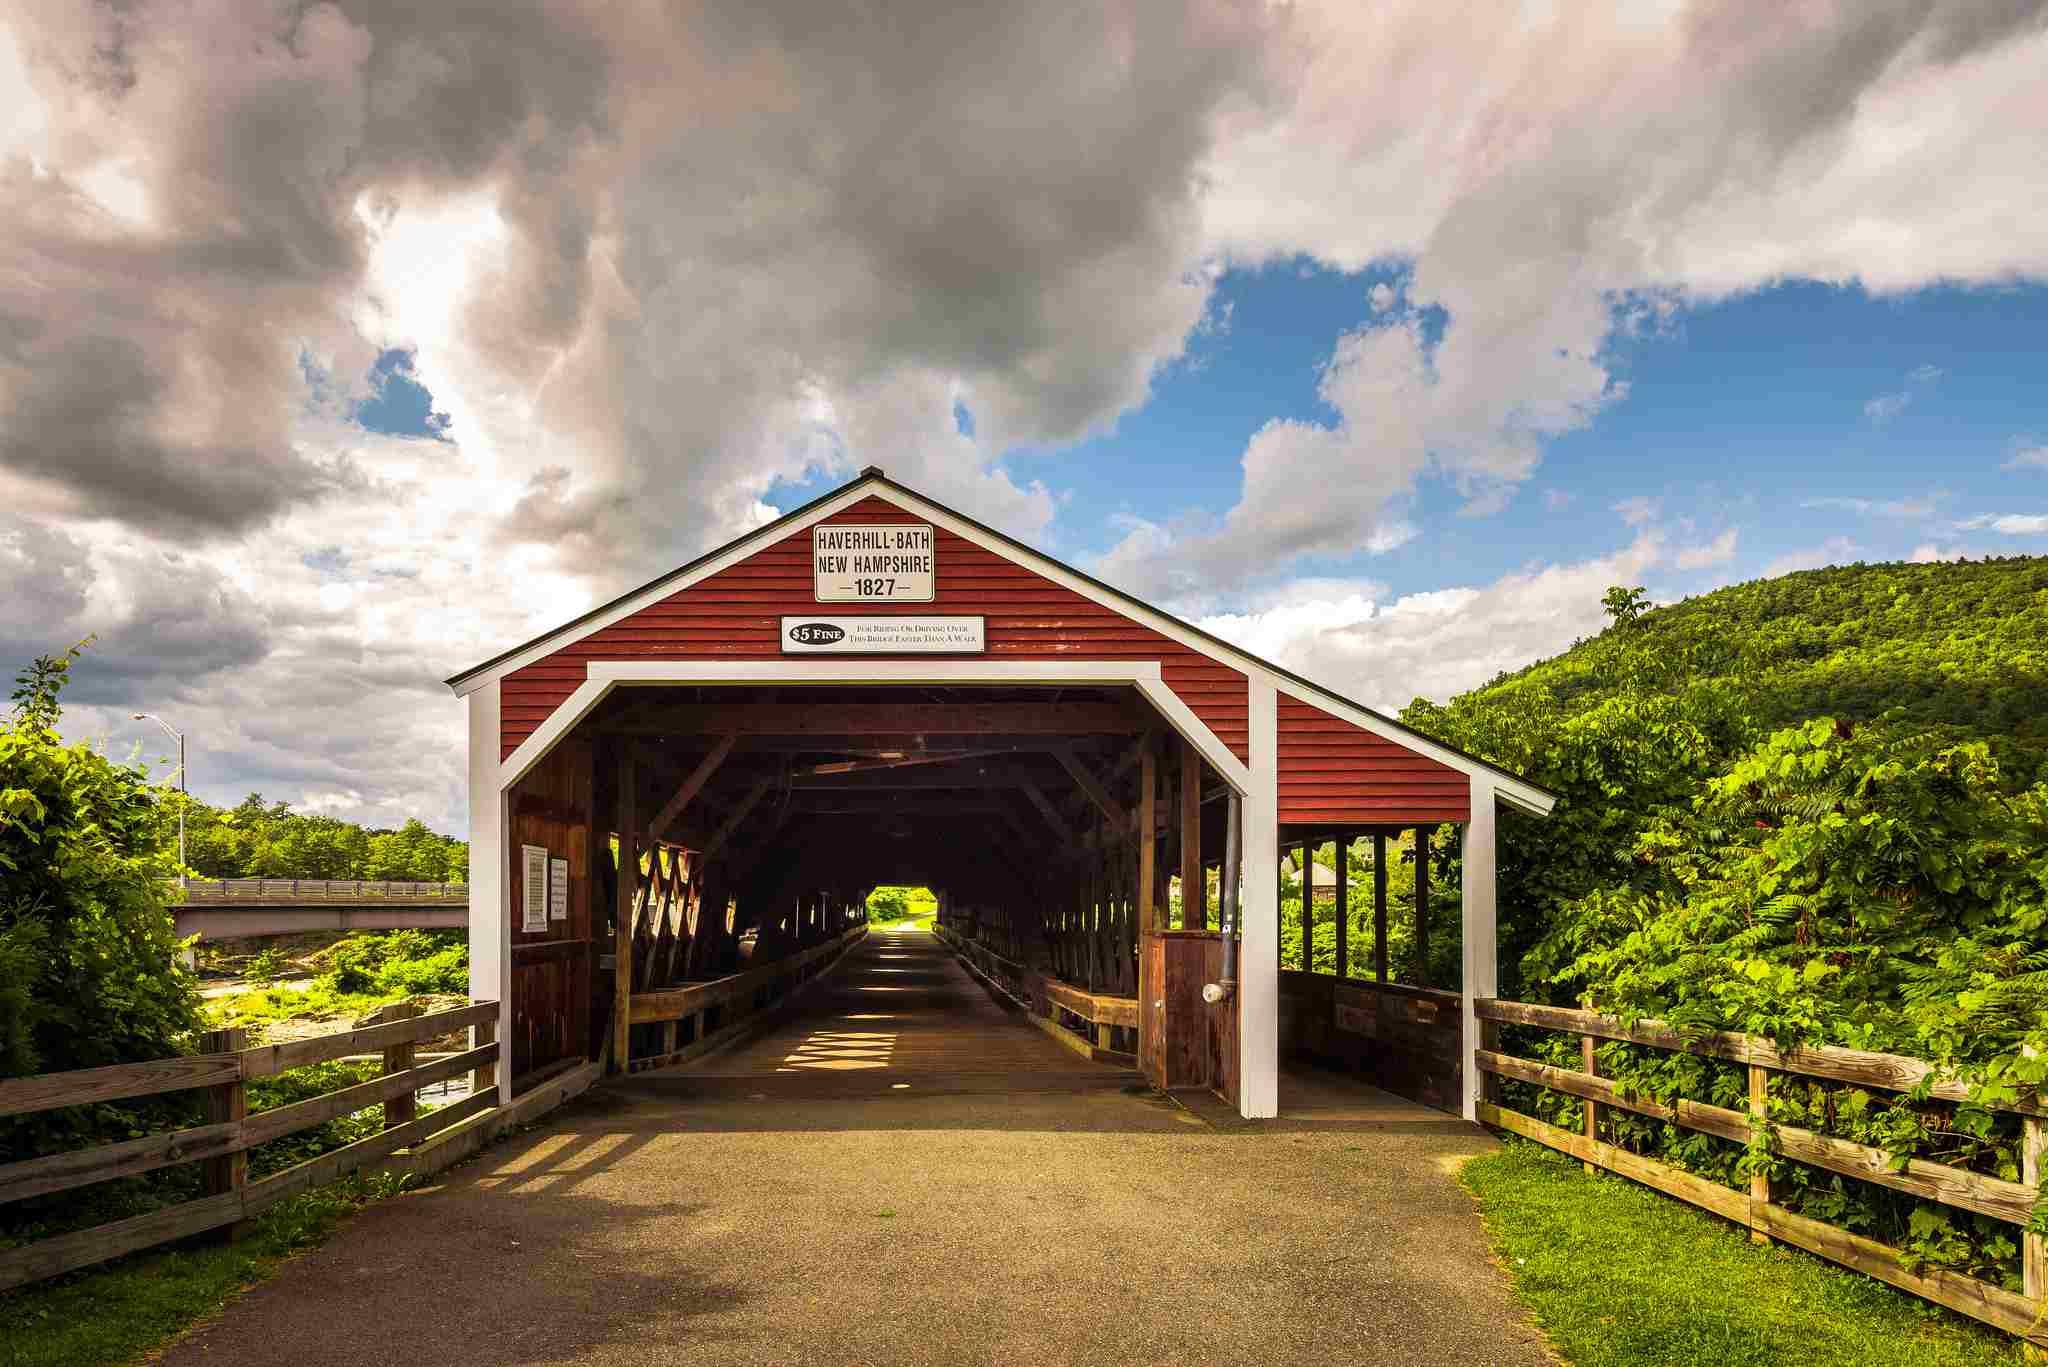 Haverhill-Bath Covered Bridge Oldest in New Hampshire